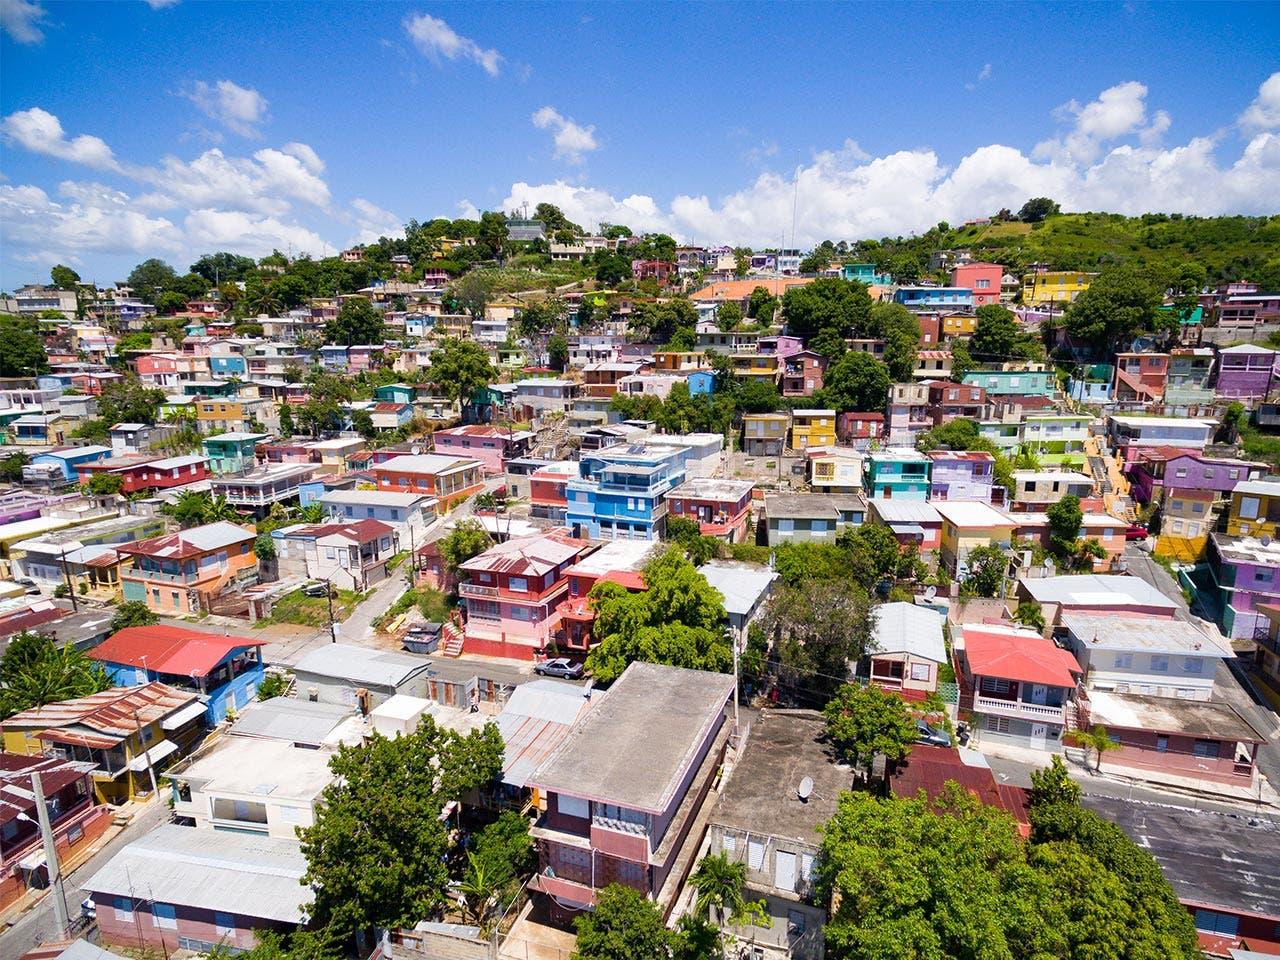 Puerto Rico | AMontes/Shutterstock.com